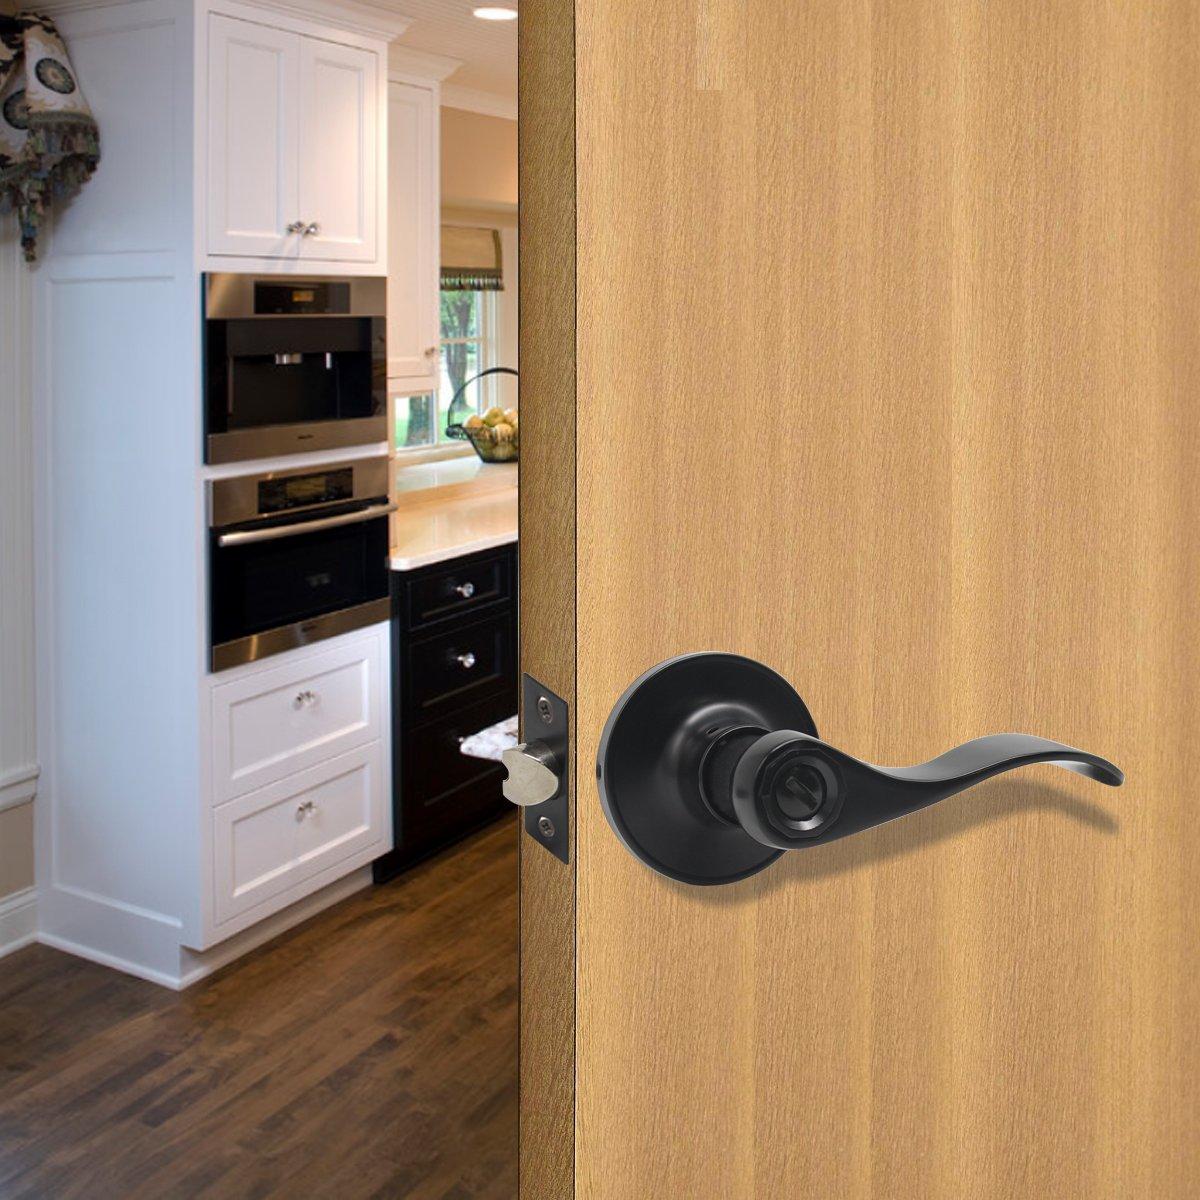 10 Pack Probrico Door Lever Privacy Door Lock Doorknobs Handle Hardware Keyless Lockset for Storage Room Bedroom Bathroom Without Key in Black-Right/Left Handed Reversible by Probrico (Image #7)